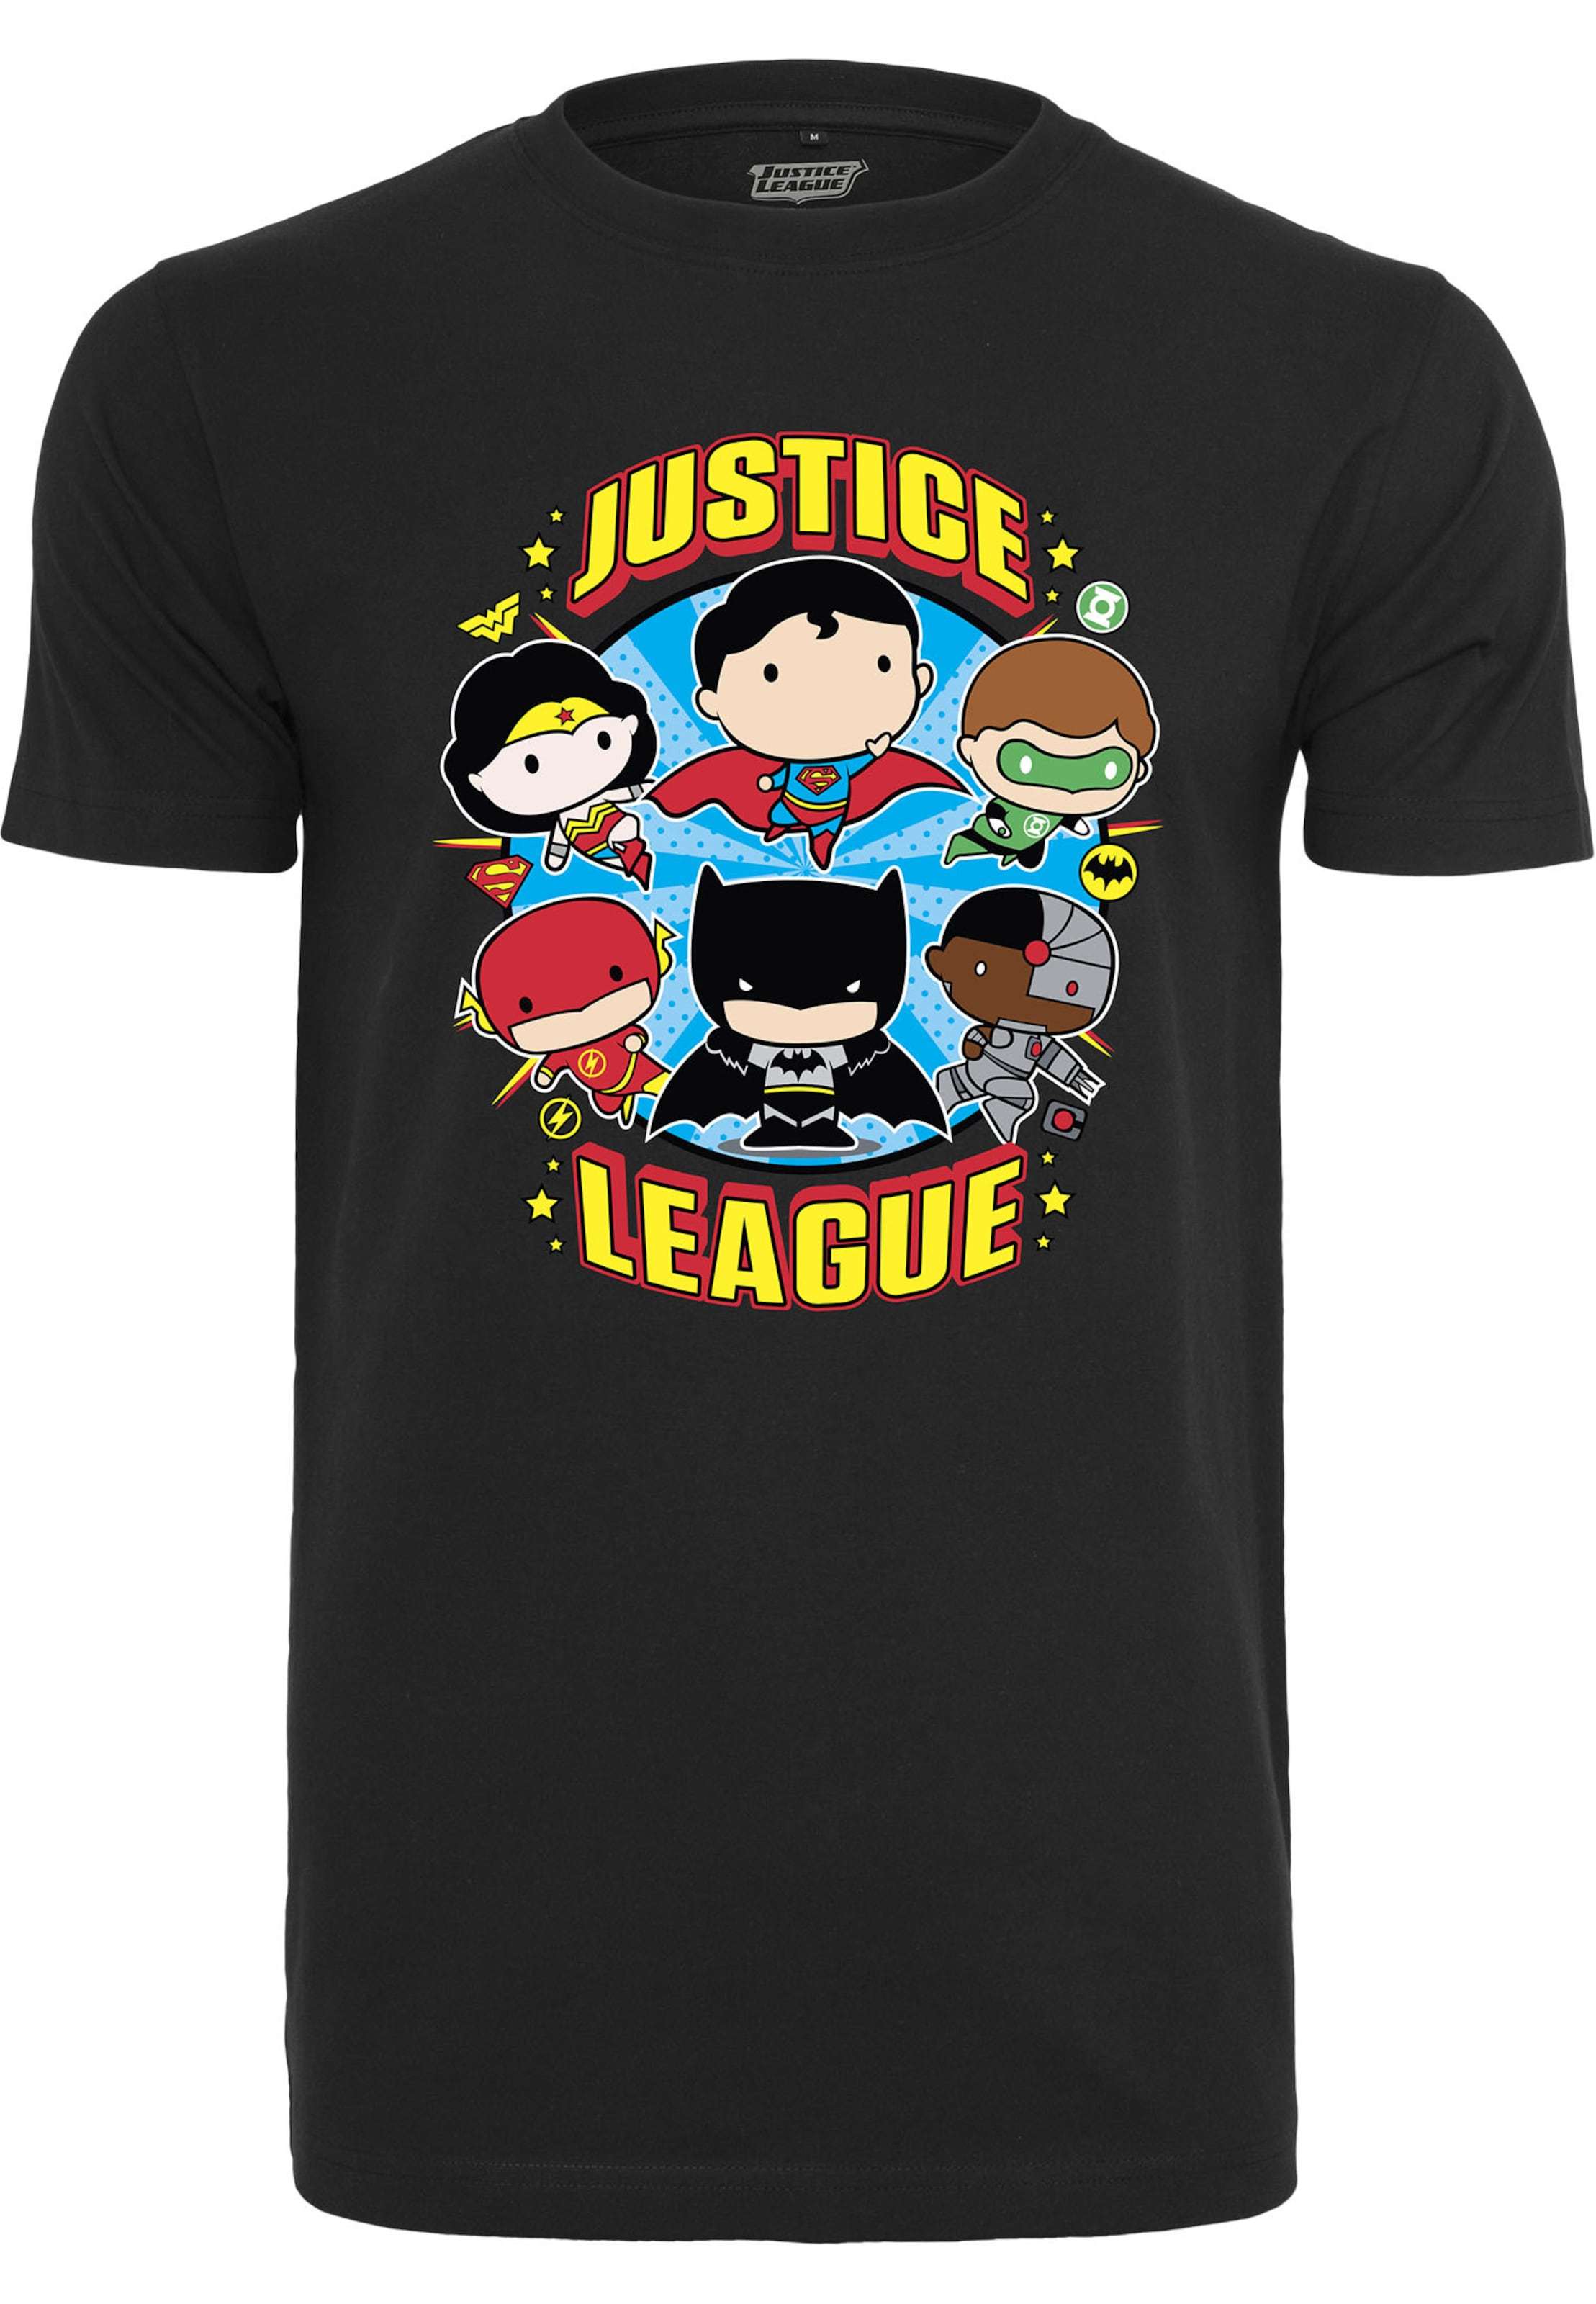 Comic Gold Tee Schwarz Shirt Mister BlauBraun Crew' 'justice In League Rostrot nwOkP80X